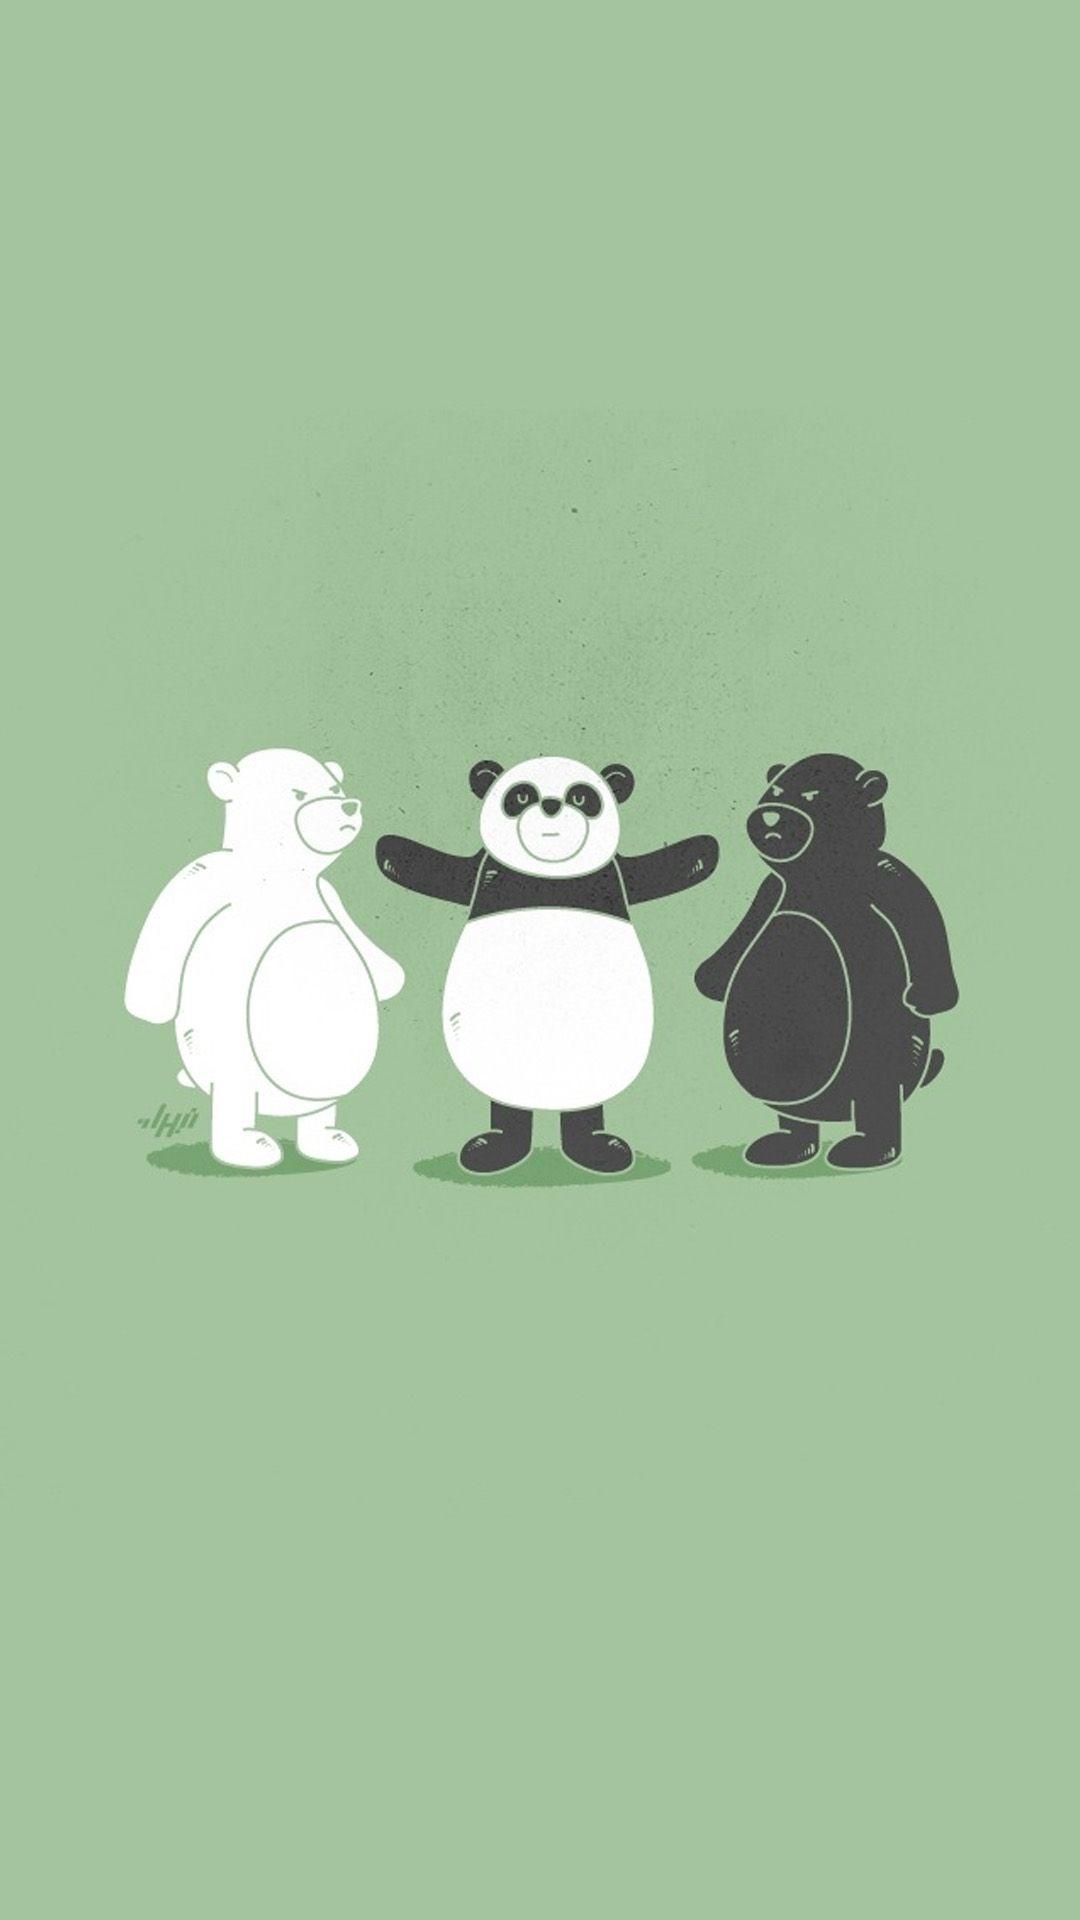 Cute Funny Animals Wallpapers Cartoon Wallpaper Funny Illustration Iphone Wallpaper